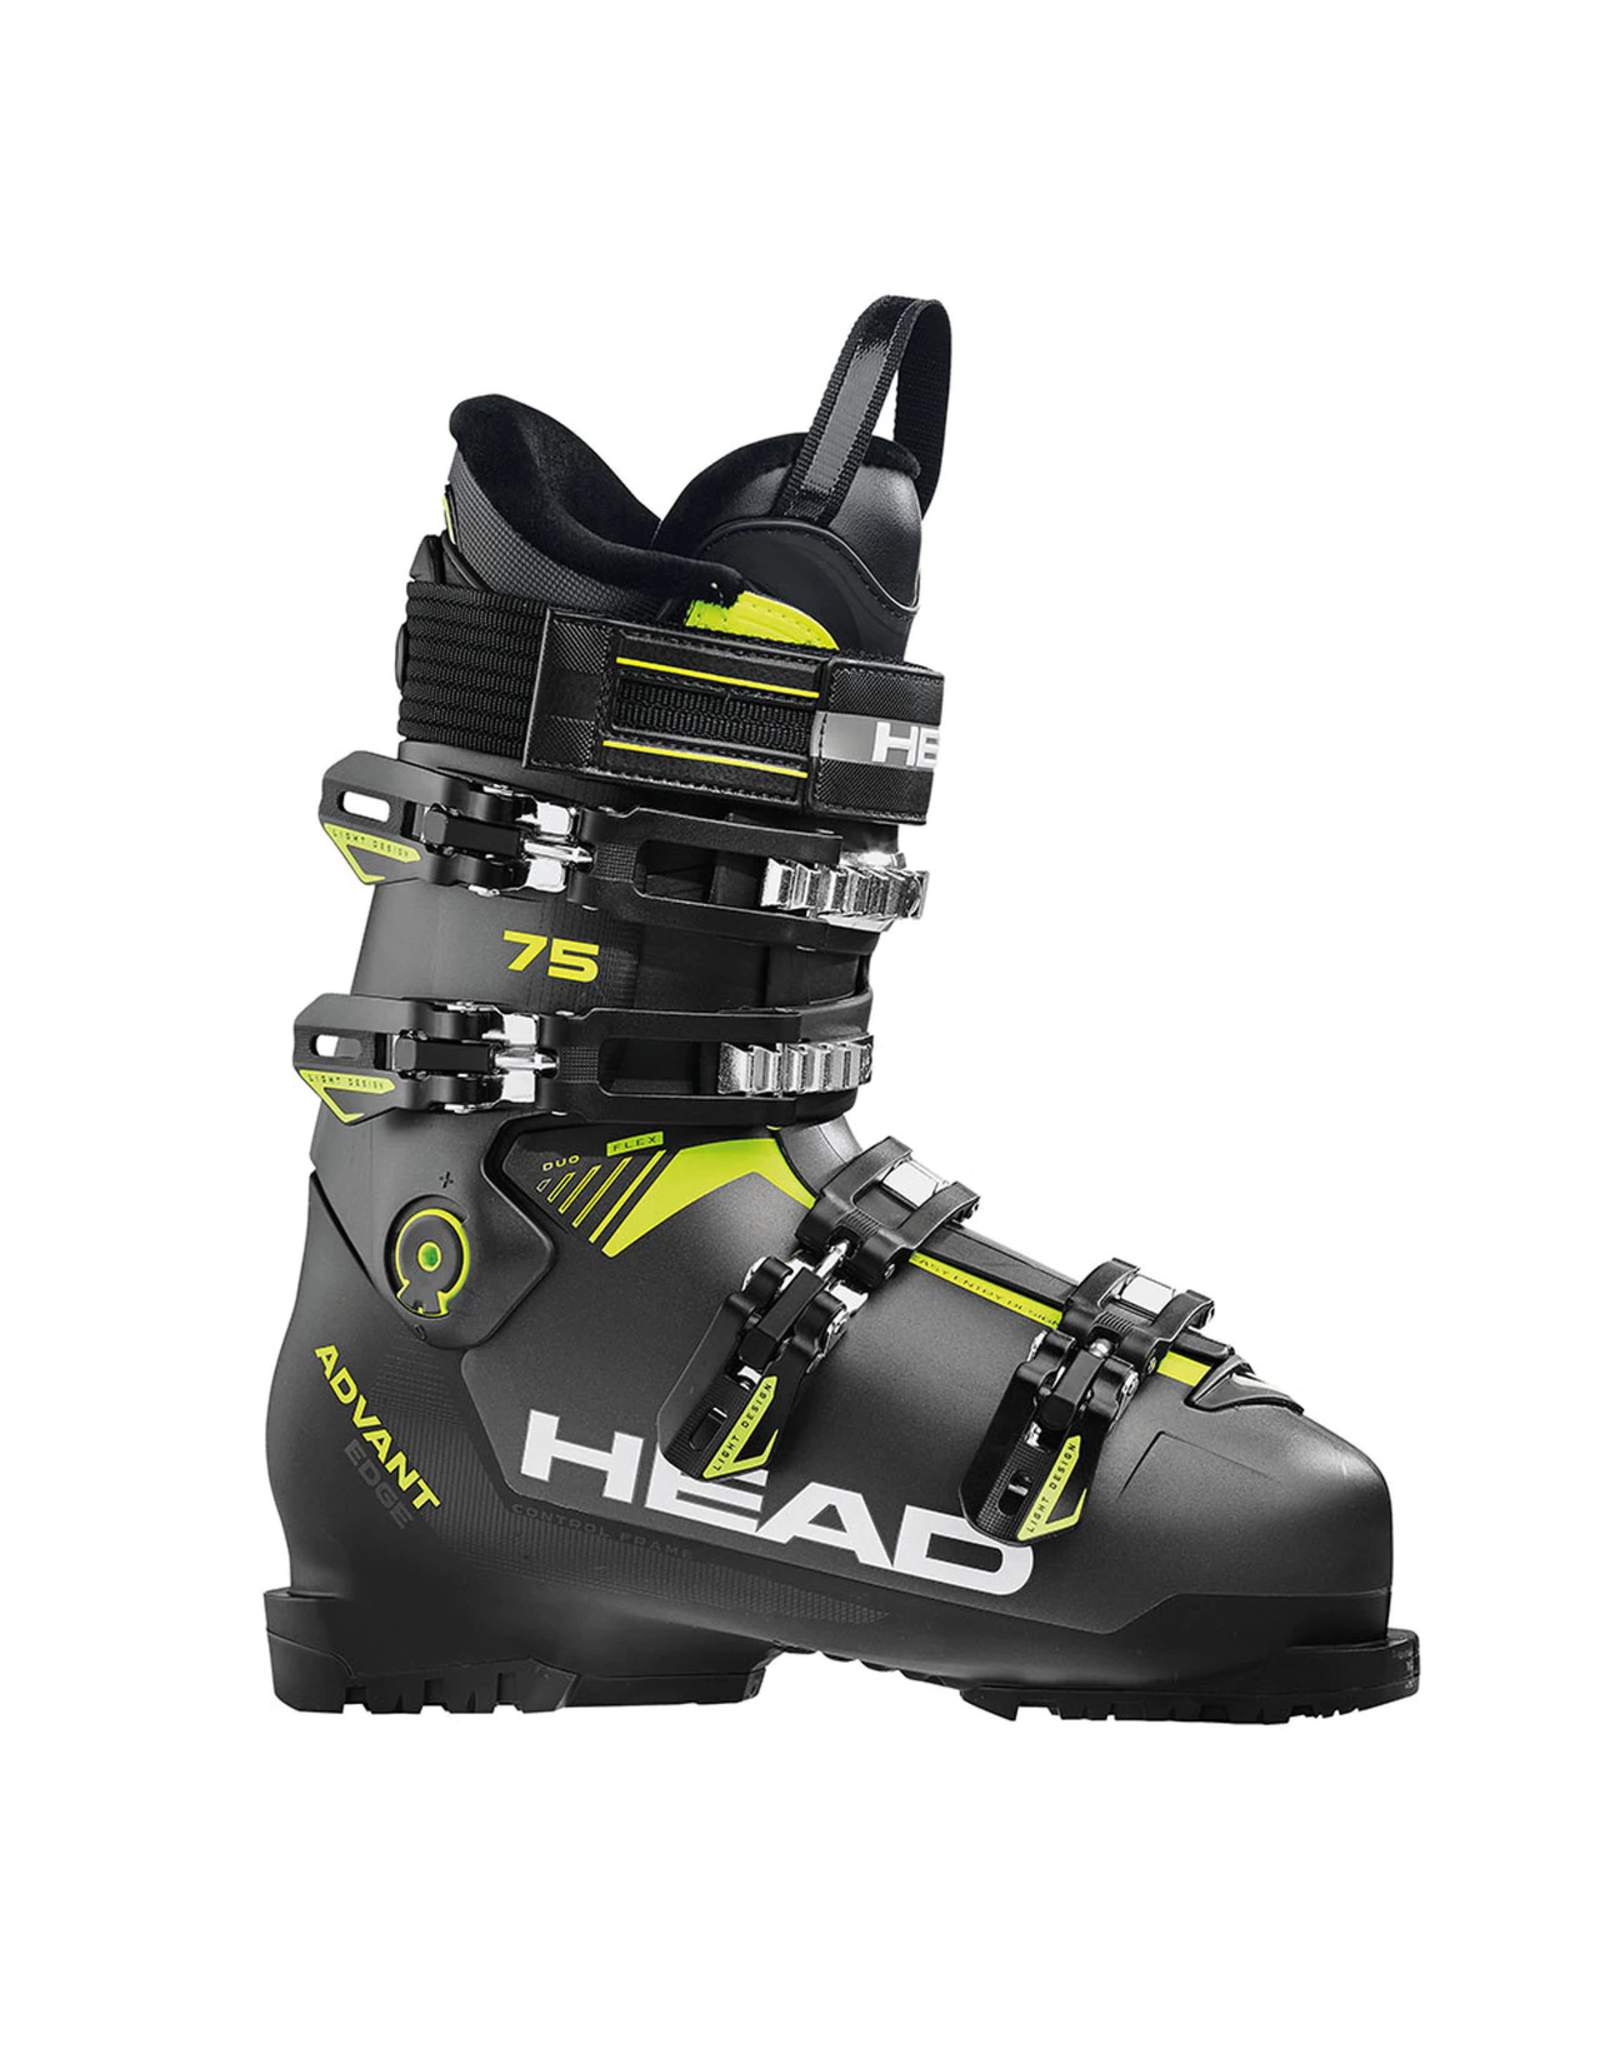 HEAD Head advant edge 75 alpine ski boot SR anth-black -yellow 22